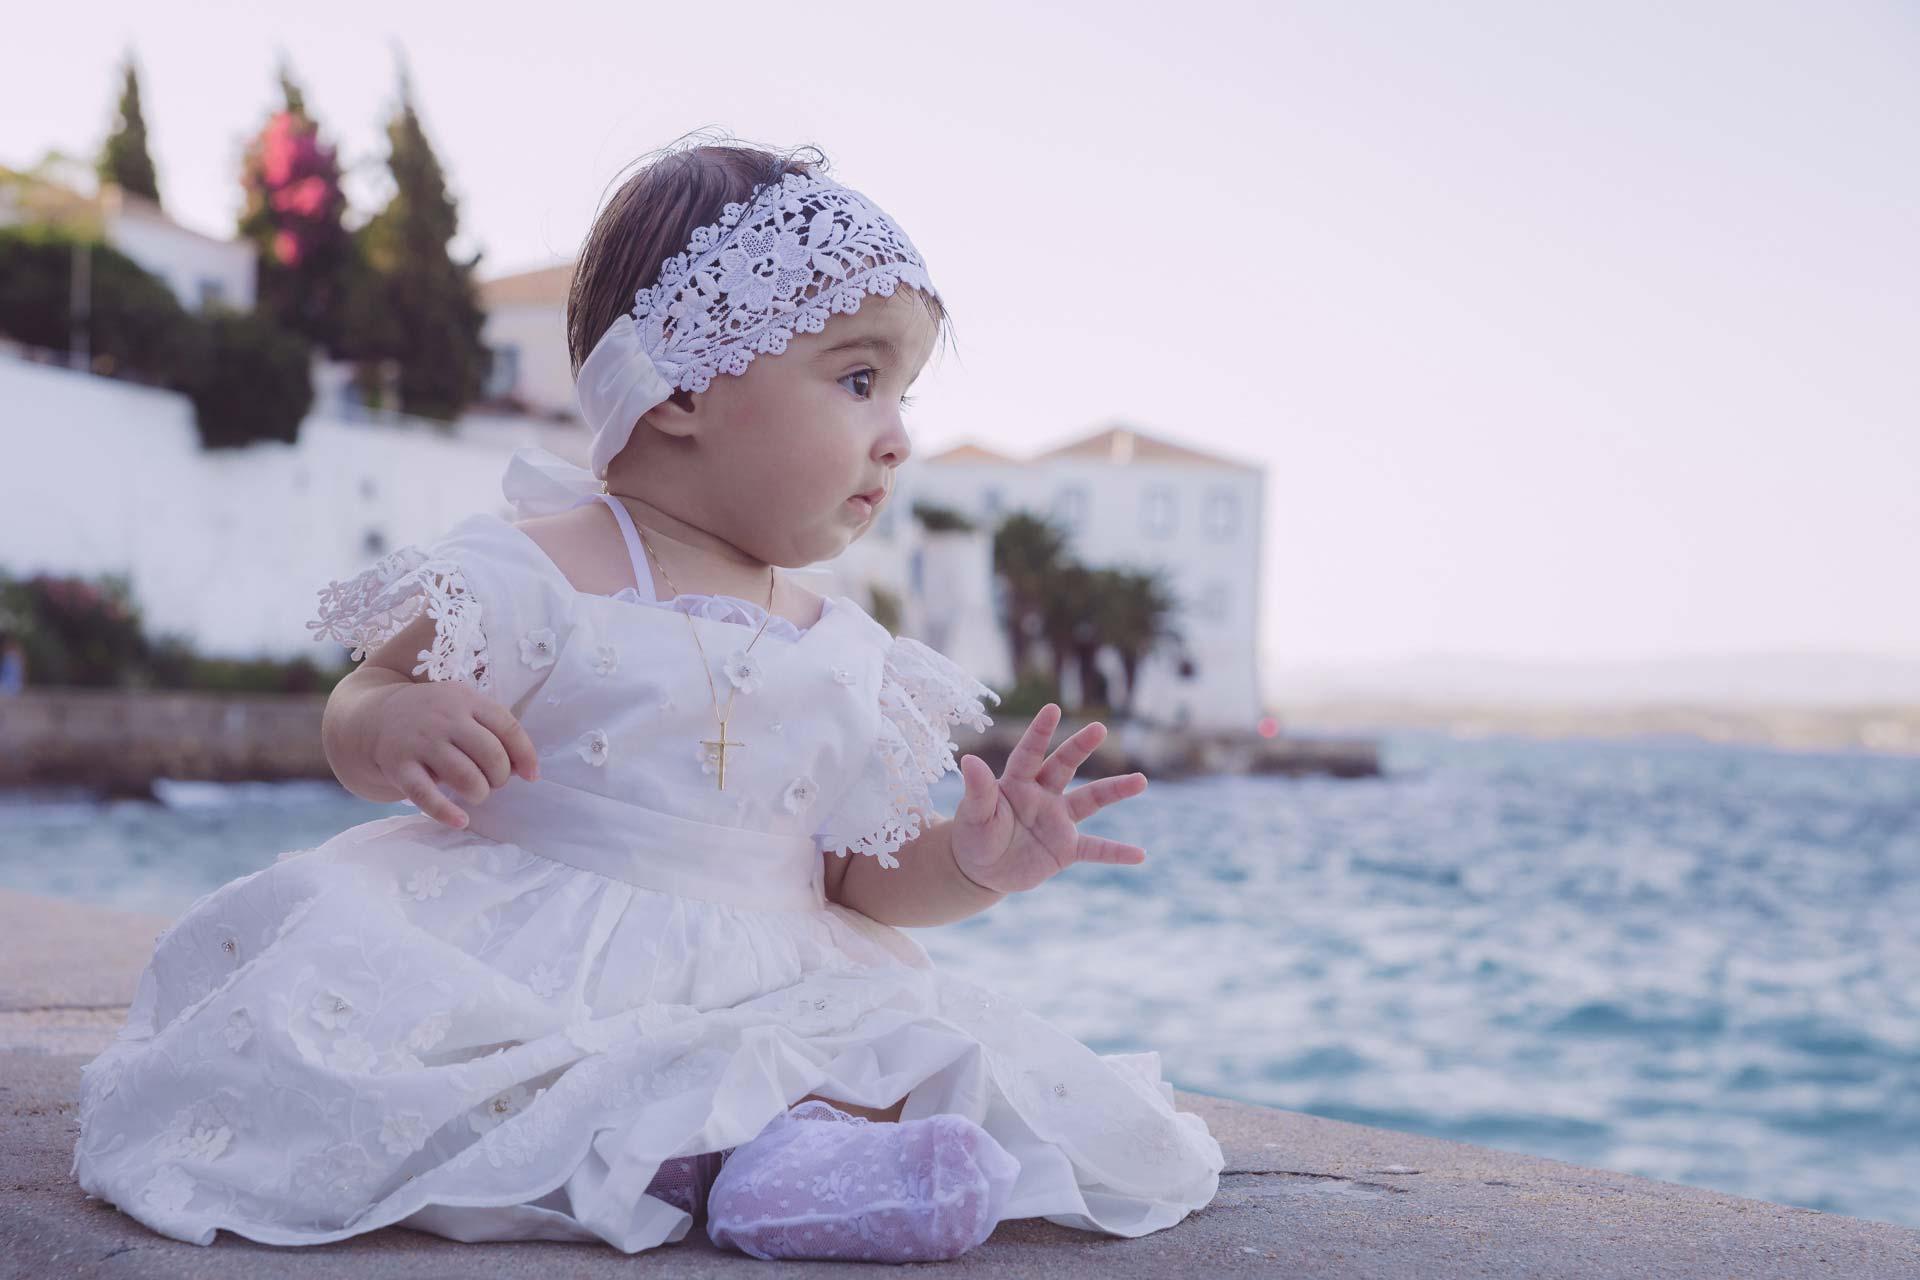 456 PhotoVaptisis βαπτιση σπετσεσ φωτογραφοσ vaptisi koritsi agios nikolaos spestes island photographer